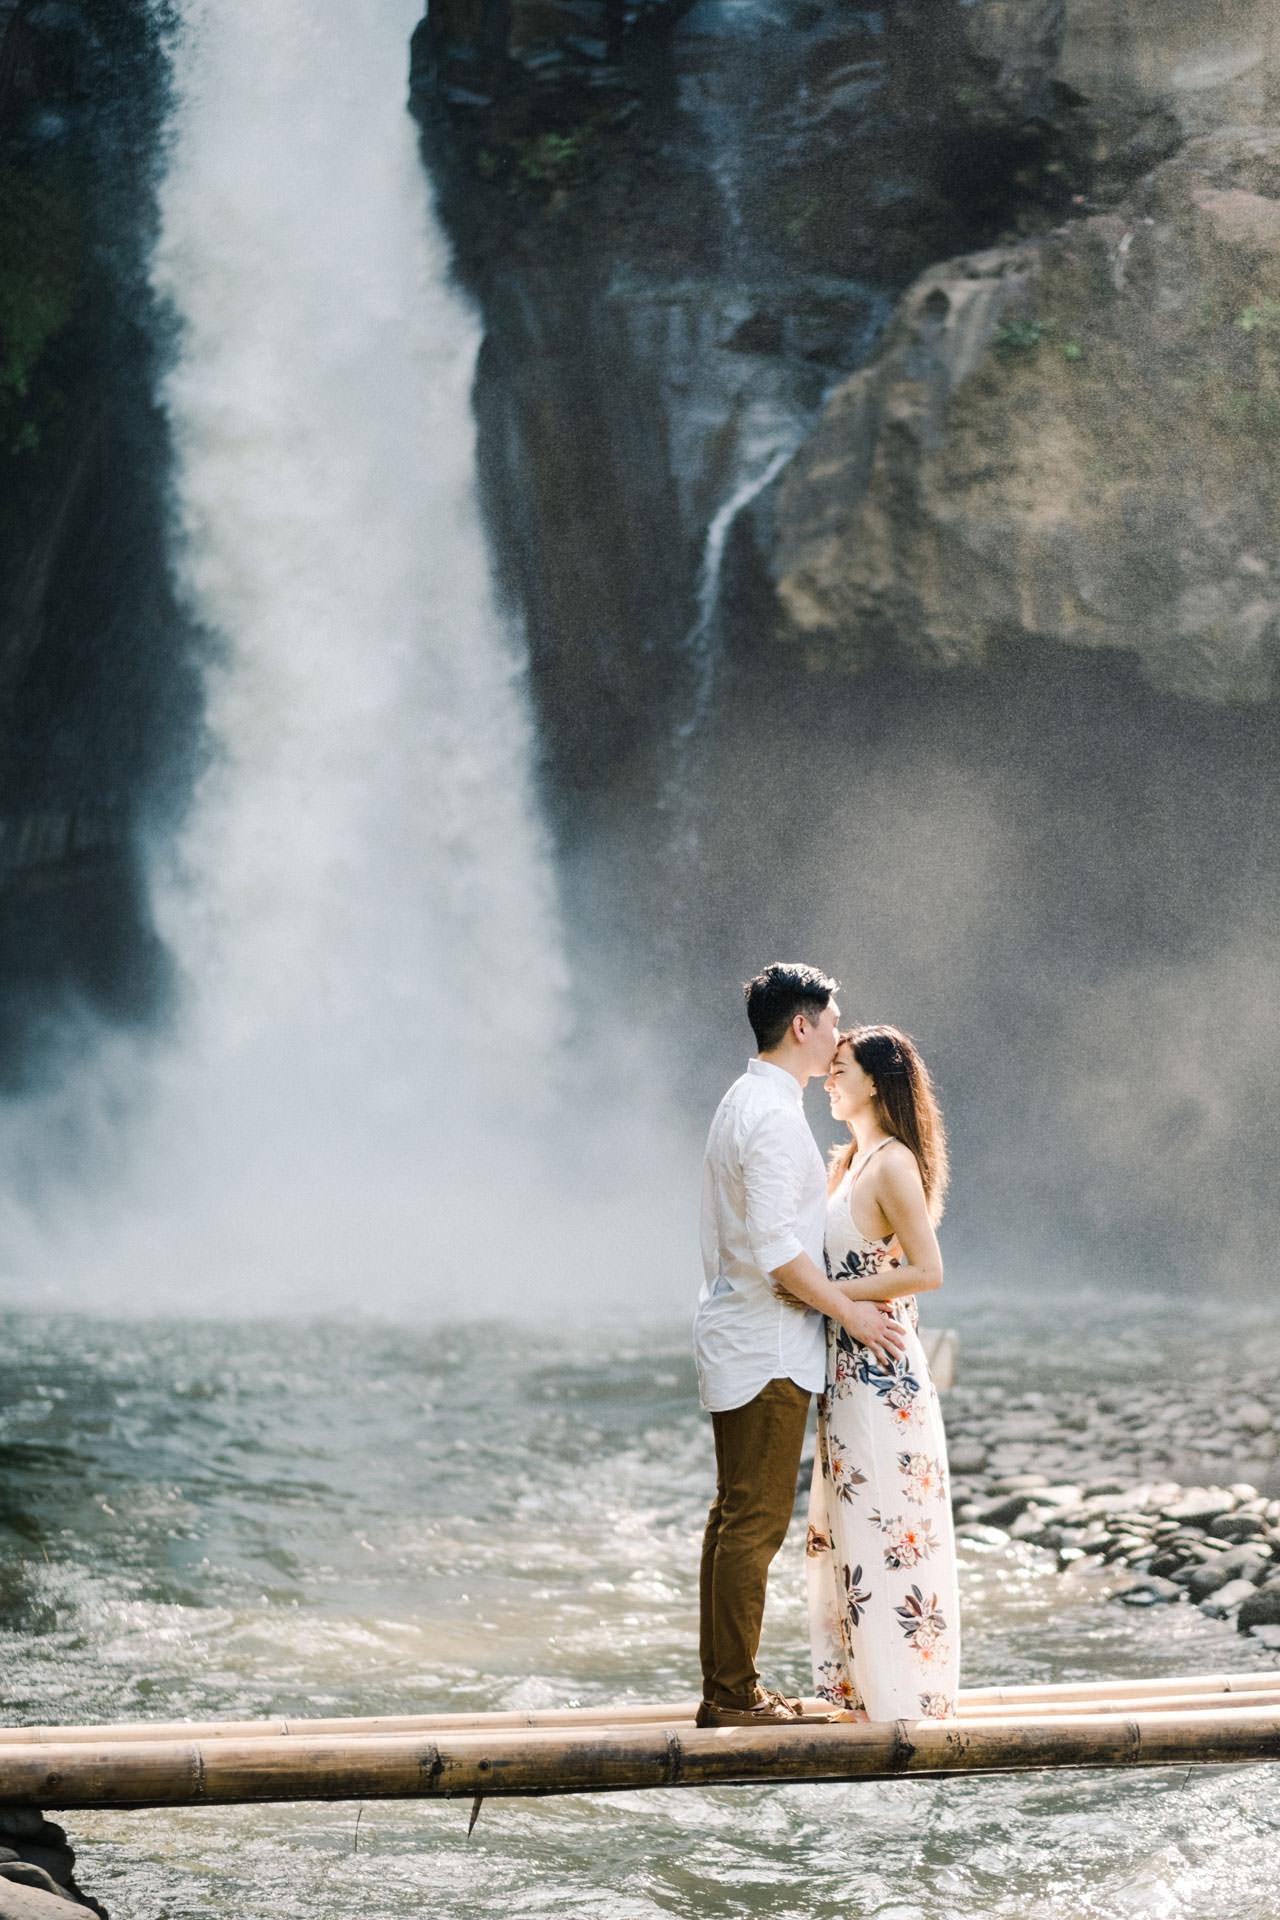 Adventurous Waterfall Surprise Proposal - Bali Vacation Proposal Ideas 9